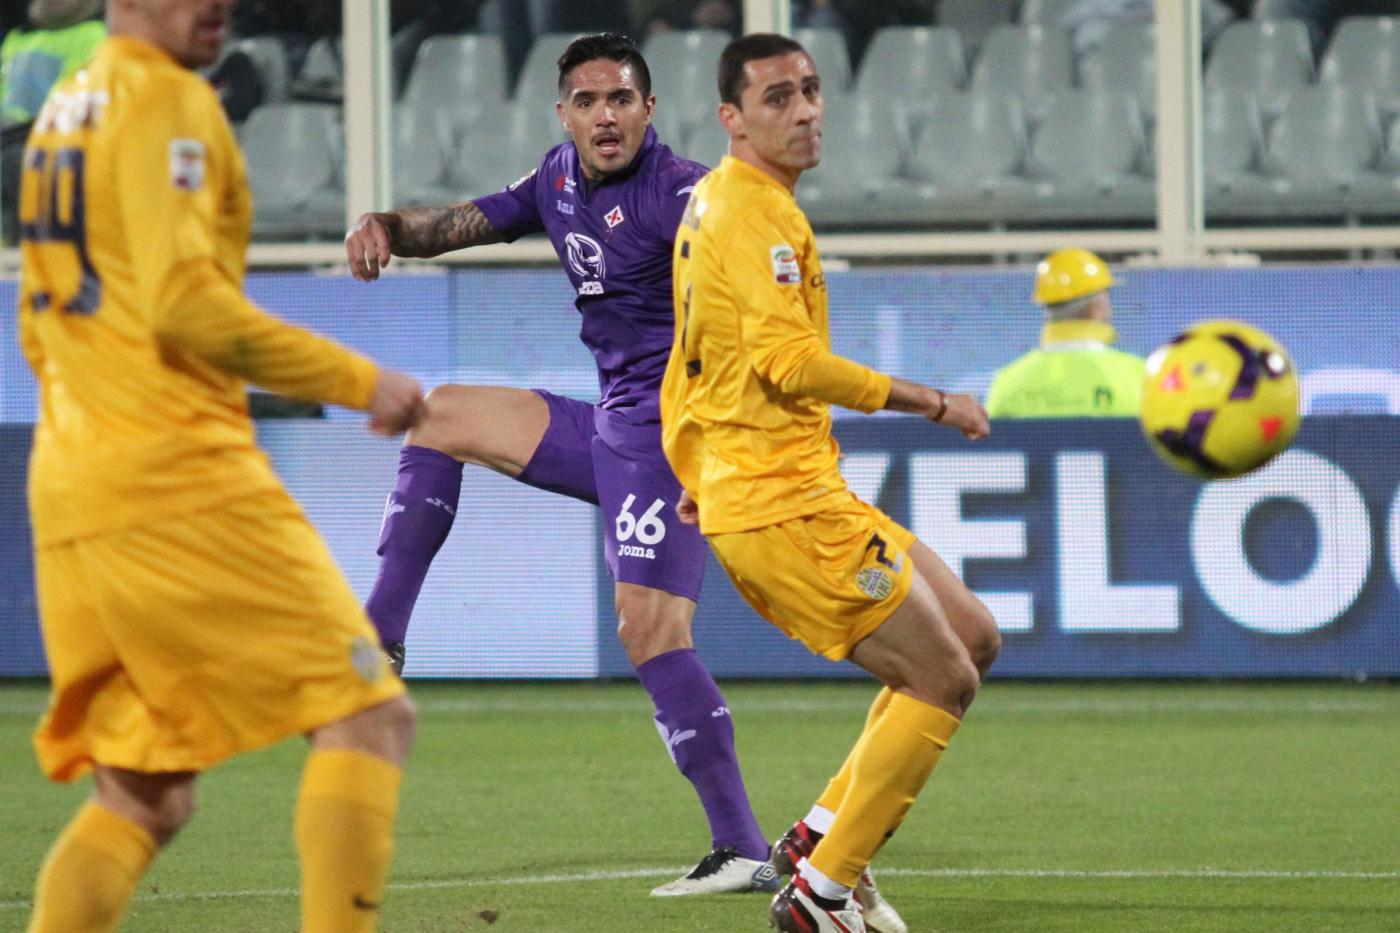 Fiorentina vs Verona 0-1: brutta sconfitta per Montella